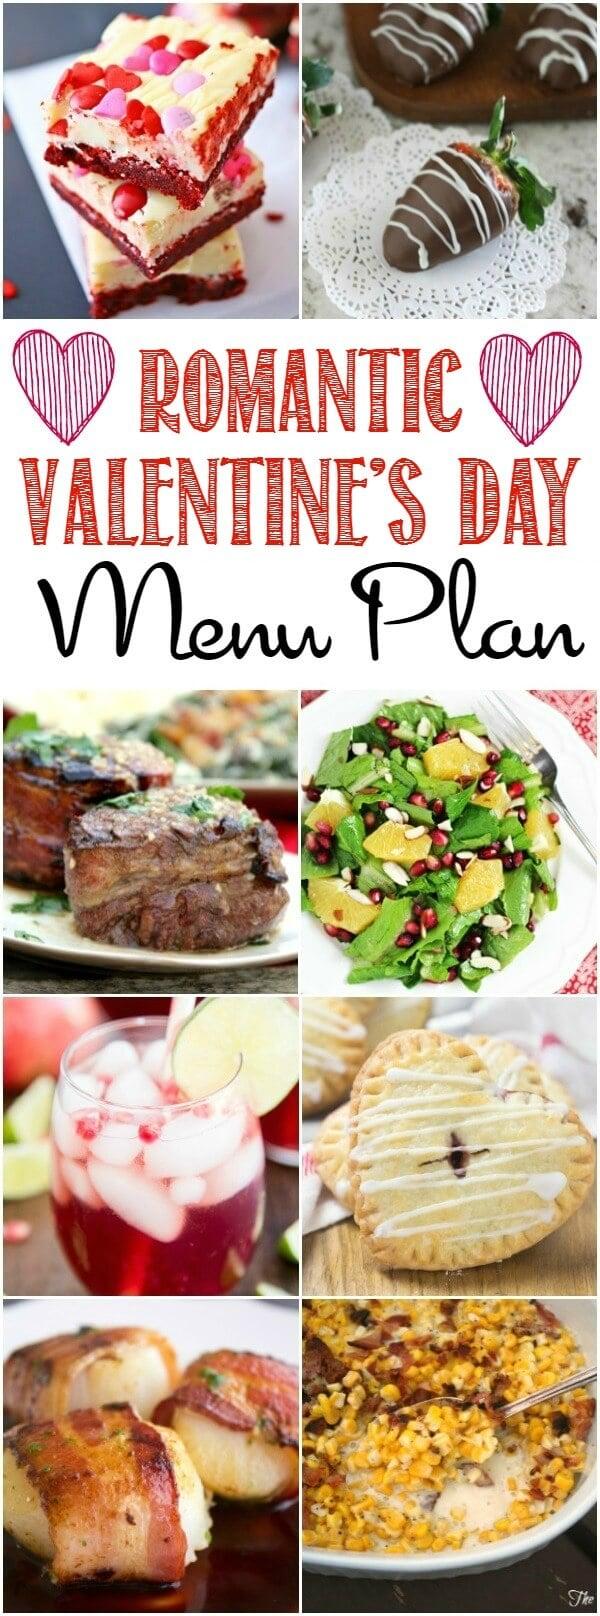 Romantic Valentines Day Menu Plan